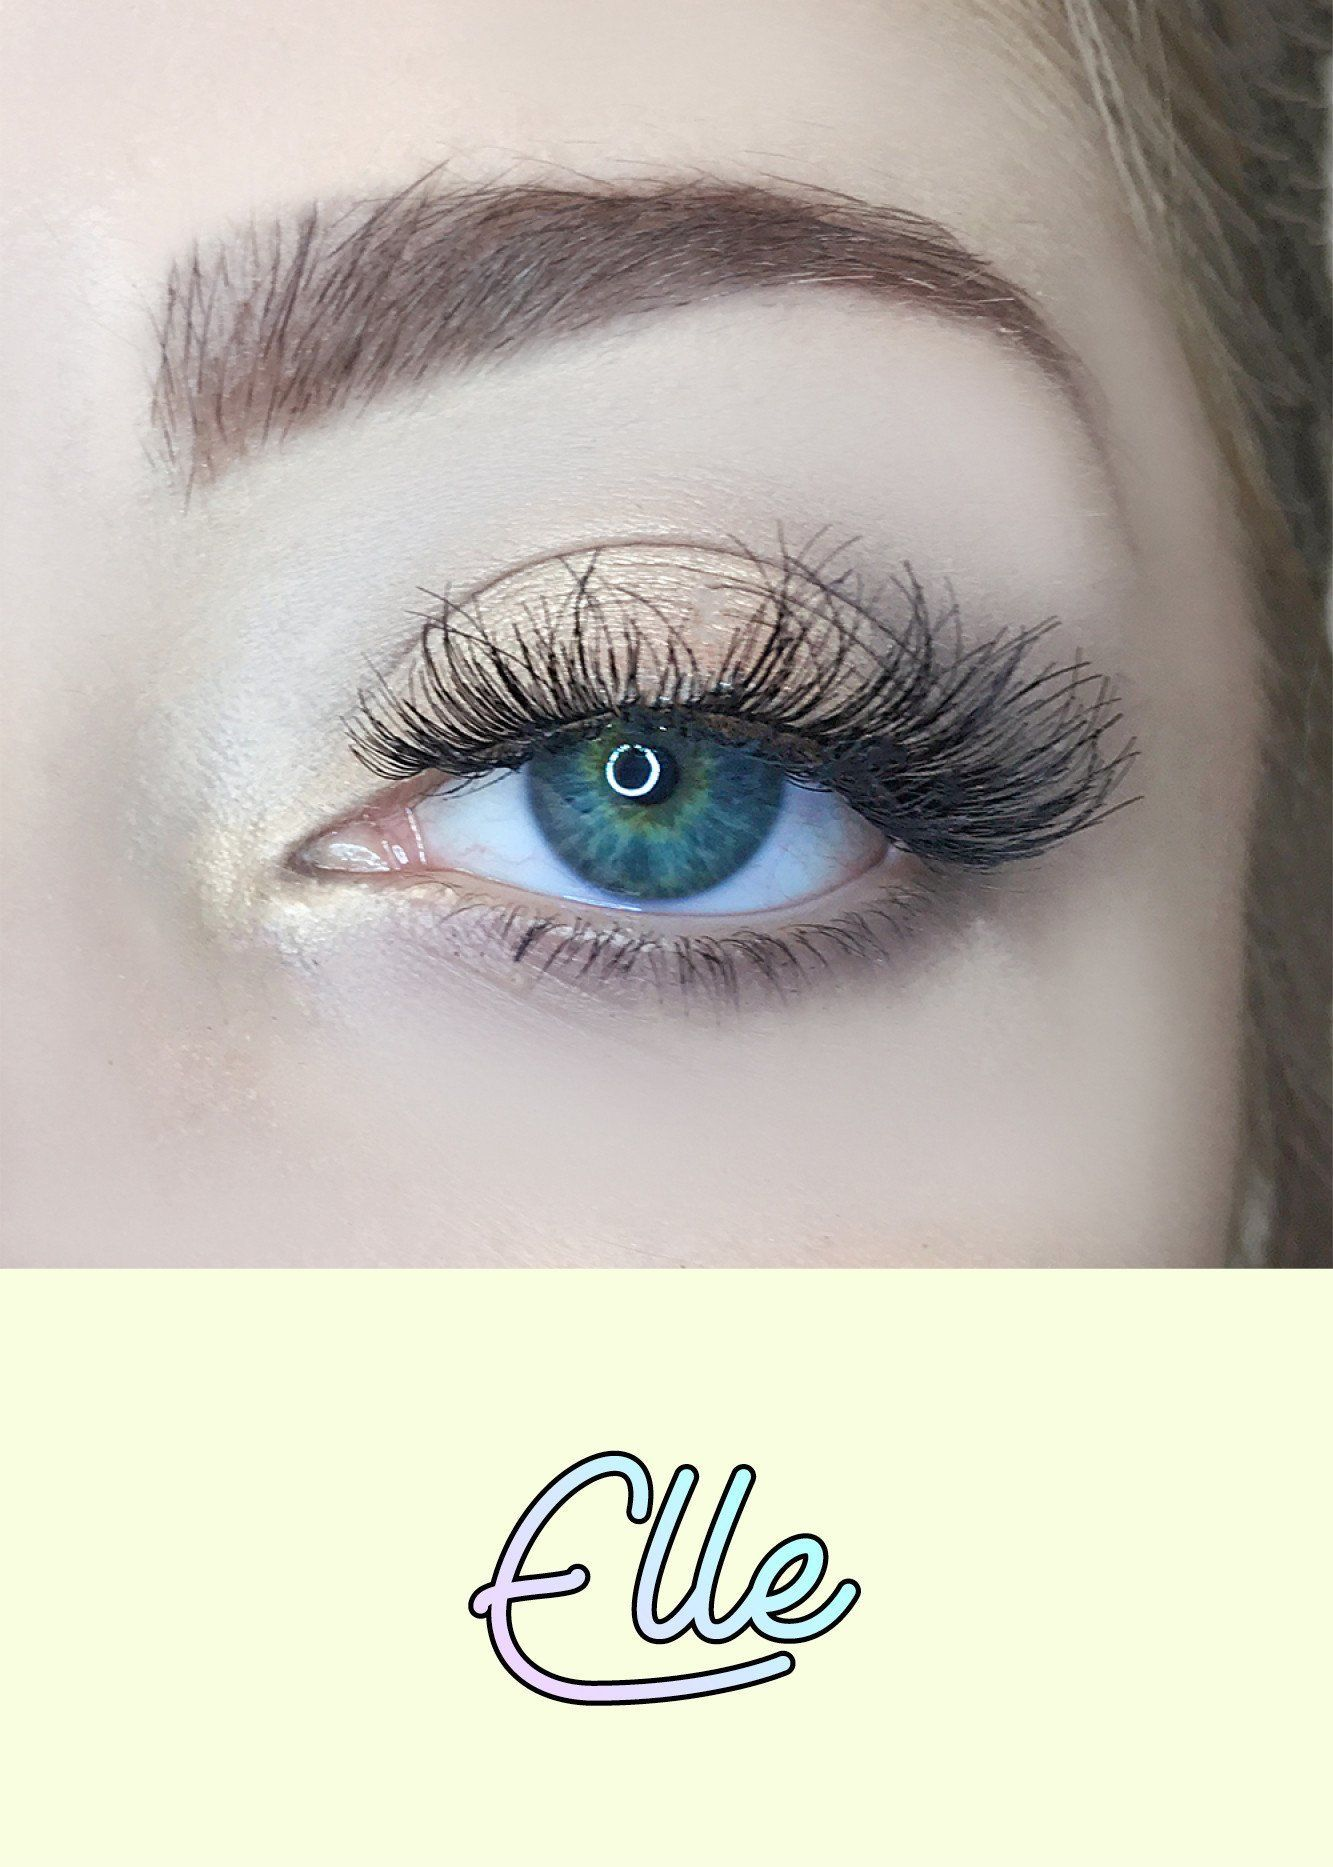 ef94bf5abae AOA Studio Eyelashes - Elle #EyelashExtensionsStyles | Eyelash ...